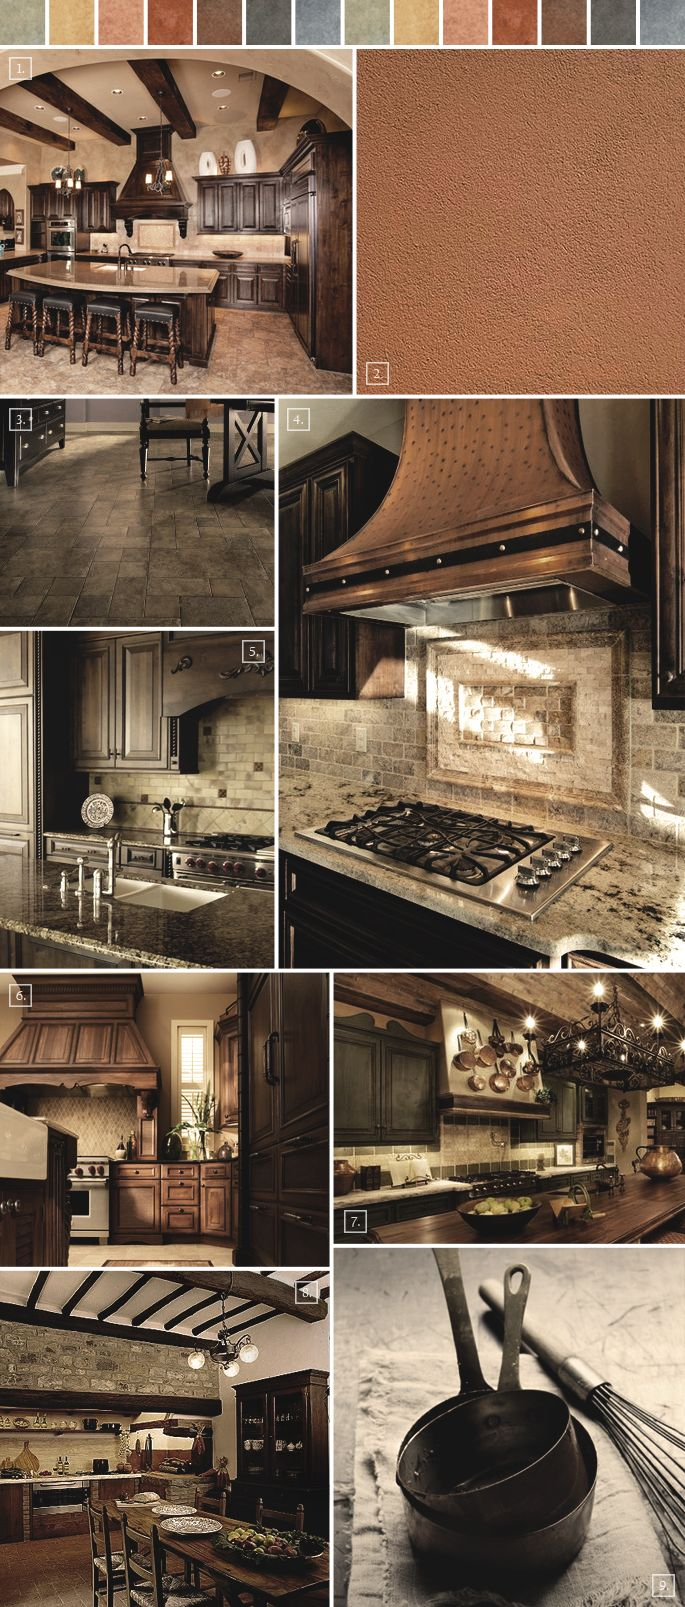 best kitchen decor images on pinterest creative decorating